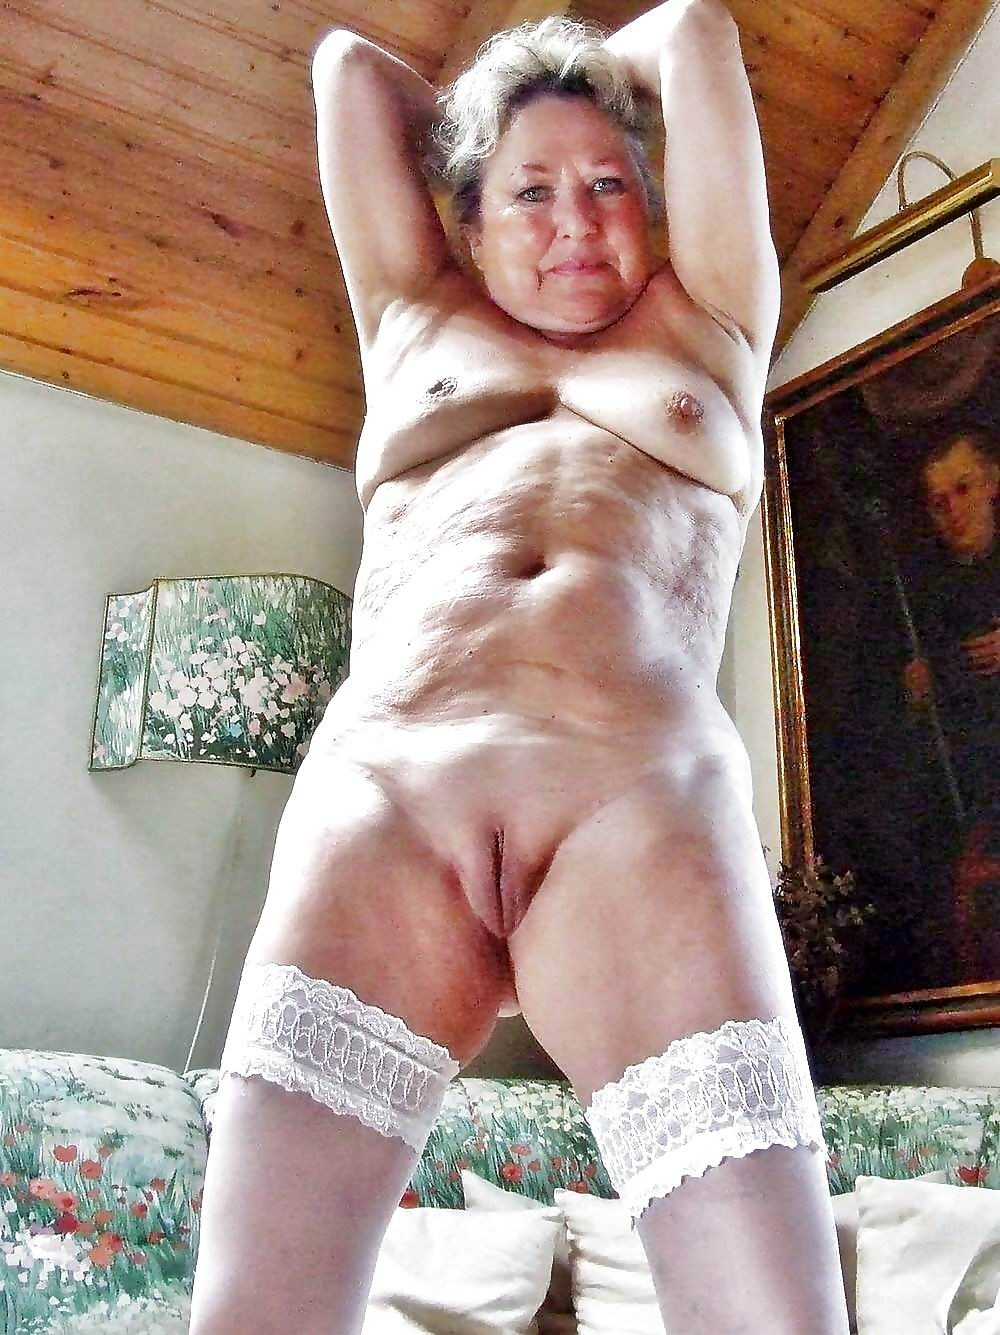 Naked older women.com